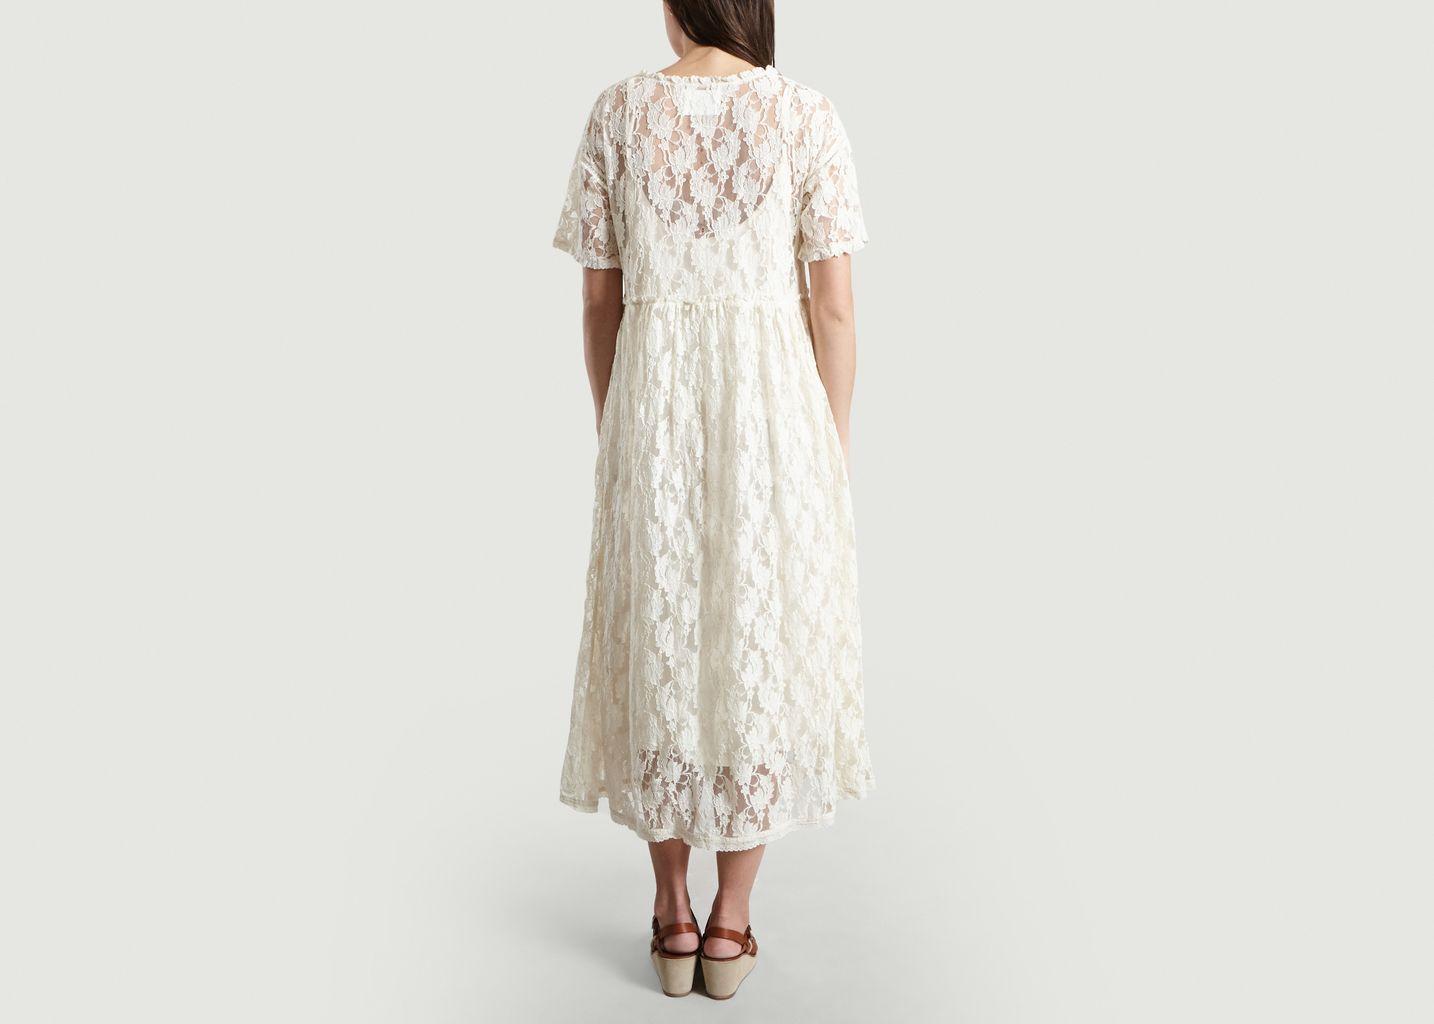 Robe Manches Courtes Roublard Lace - Leon & Harper